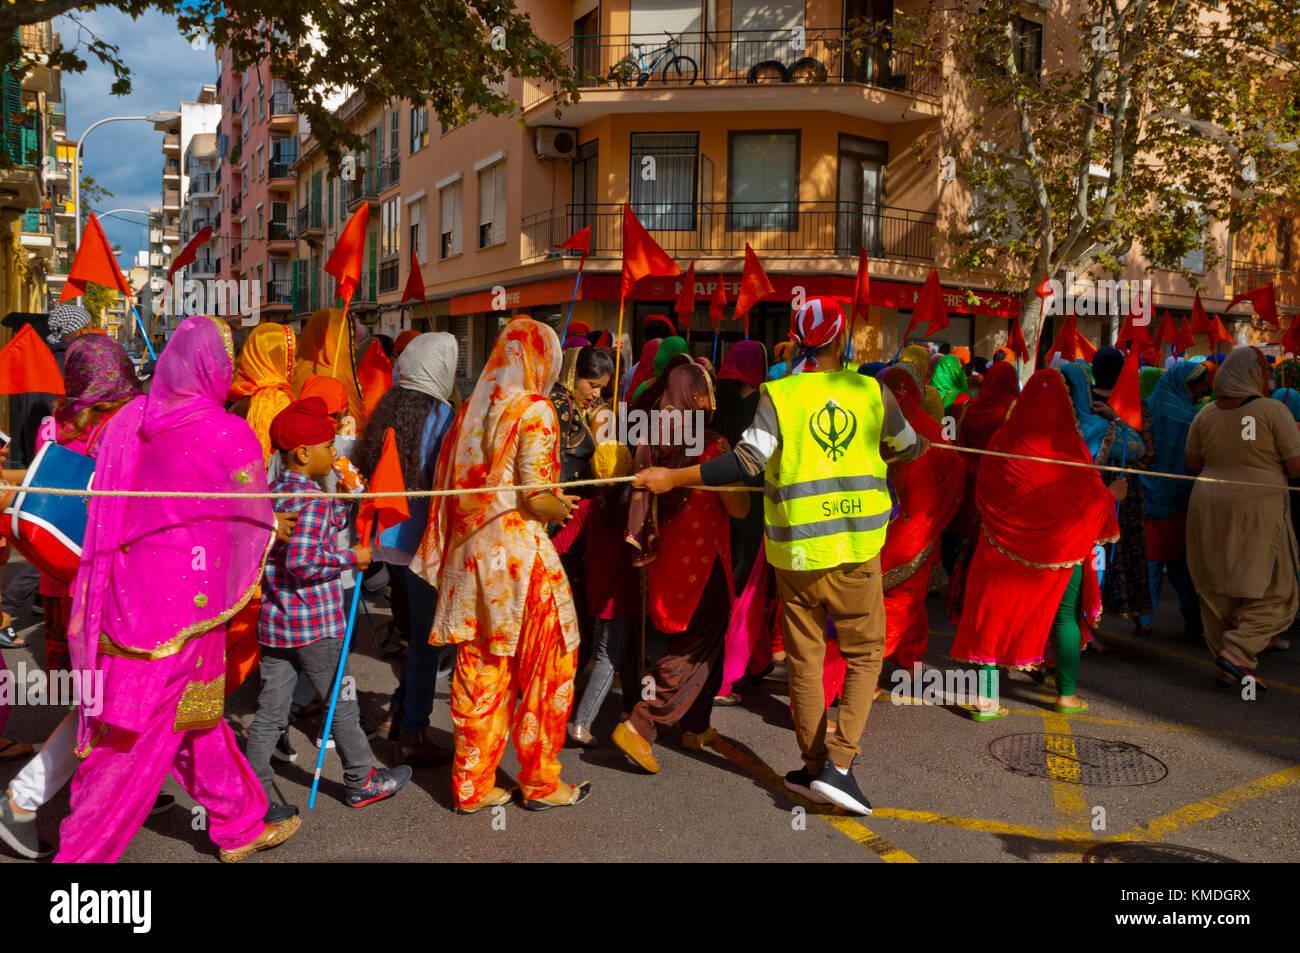 March and celebration of founder of Sikh religion, Guru Nanak Dev Ji, Palma, Mallorca, Balearic islands, Spain - Stock Image